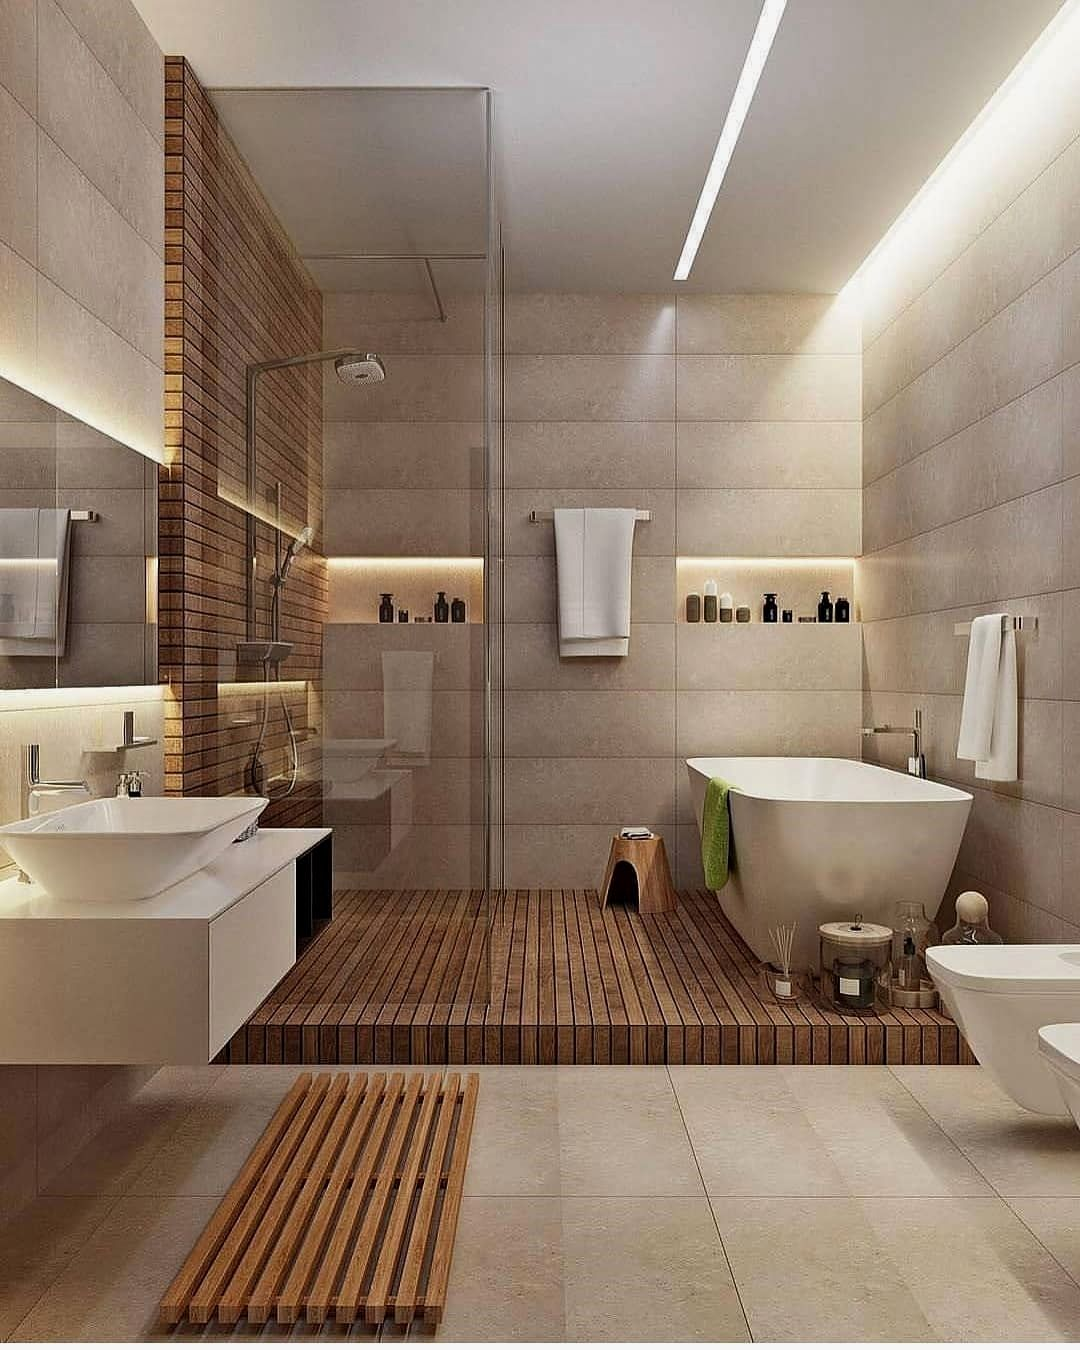 3d Home Design Architecture On Instagram Wow Amazing Bathroom Concept Via Sebarchitecture Top Bathroom Design Bathroom Interior Design Bathroom Design Viral home designer bathroom design